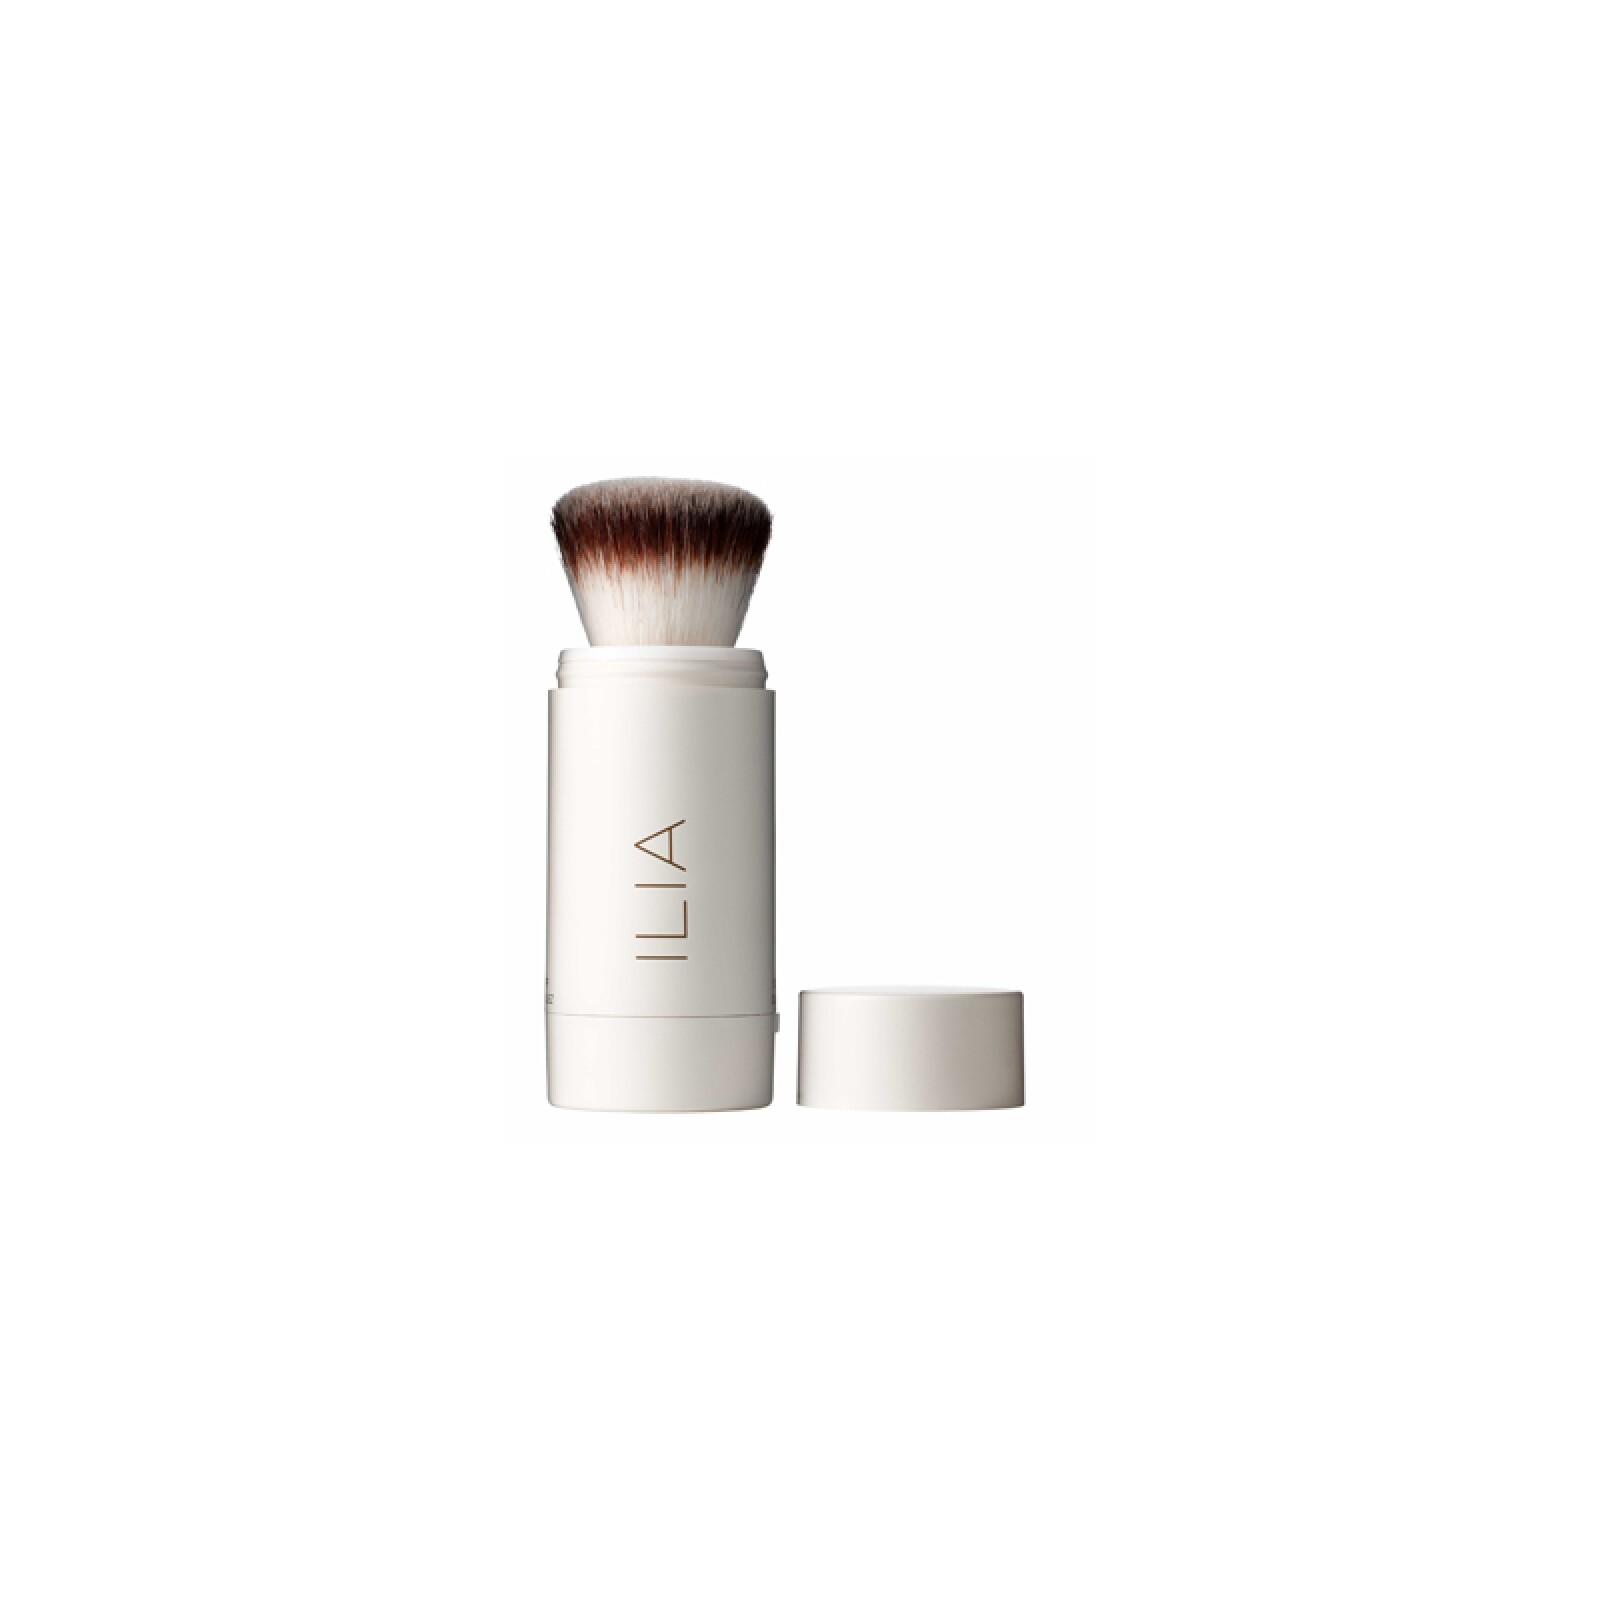 polvos-selladores-maquillaje-setting powder-baking-makeup-ilia